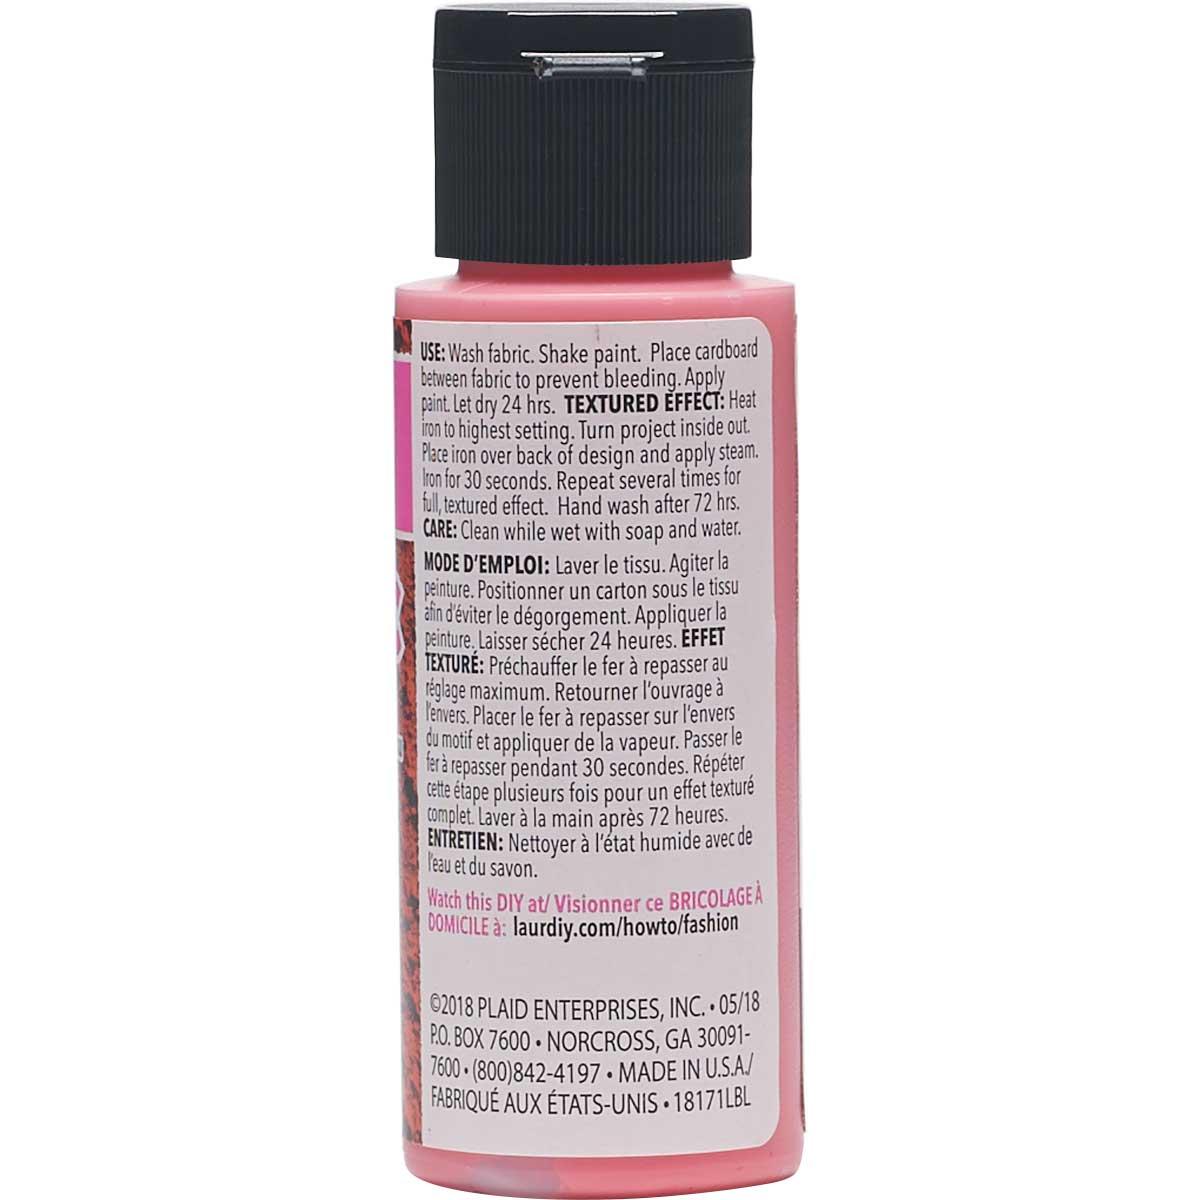 LaurDIY ® Texturific™ Fabric Paint - Rose Red, 2 oz.